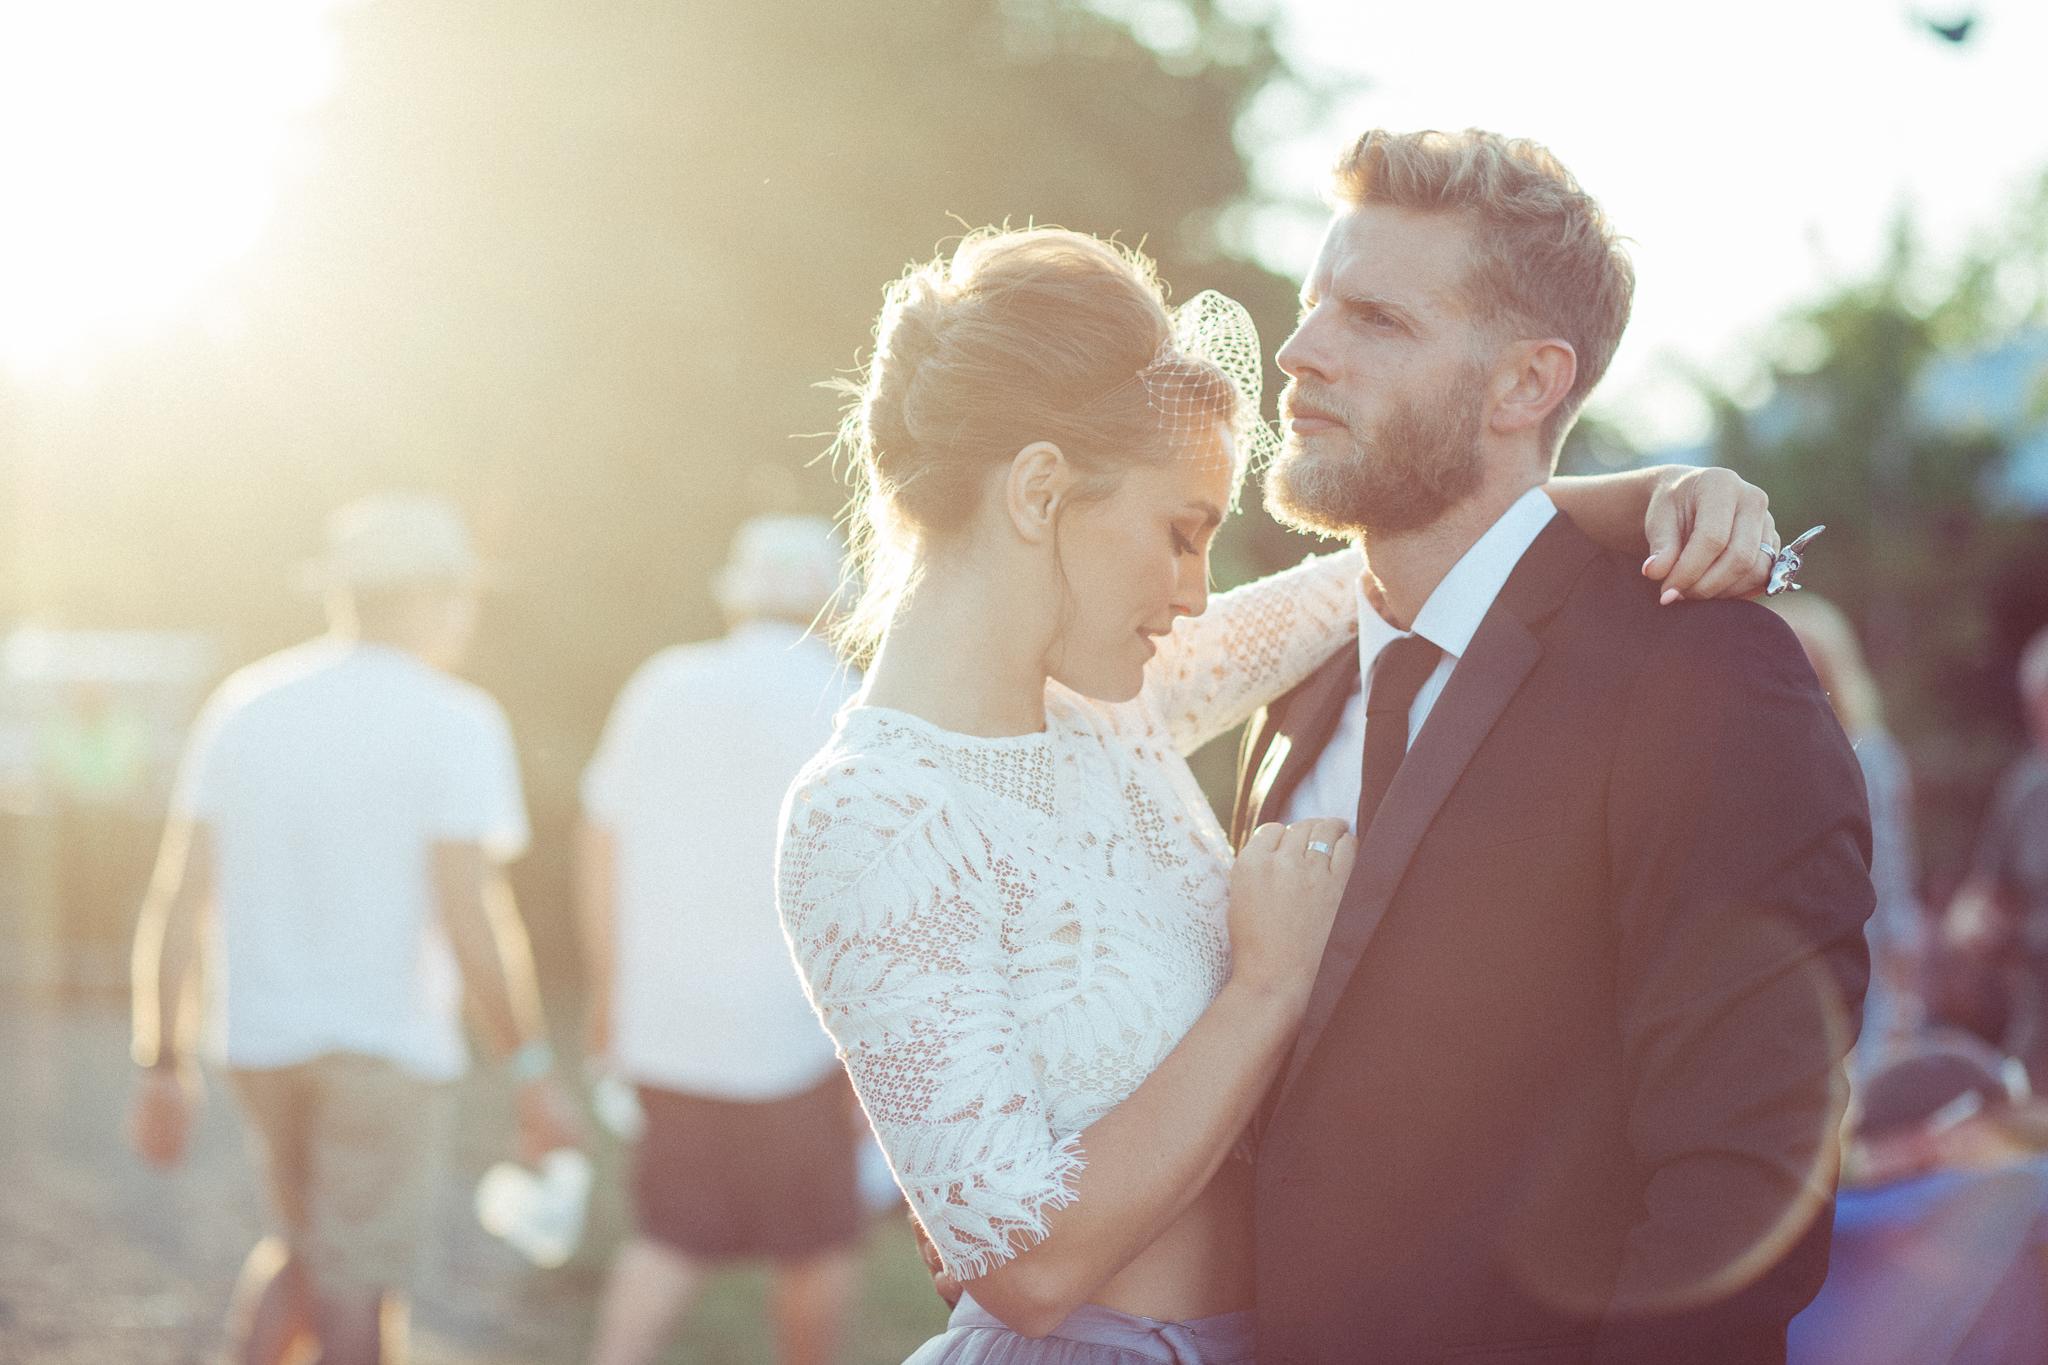 Happy couple | Image courtesy of Adj Brown